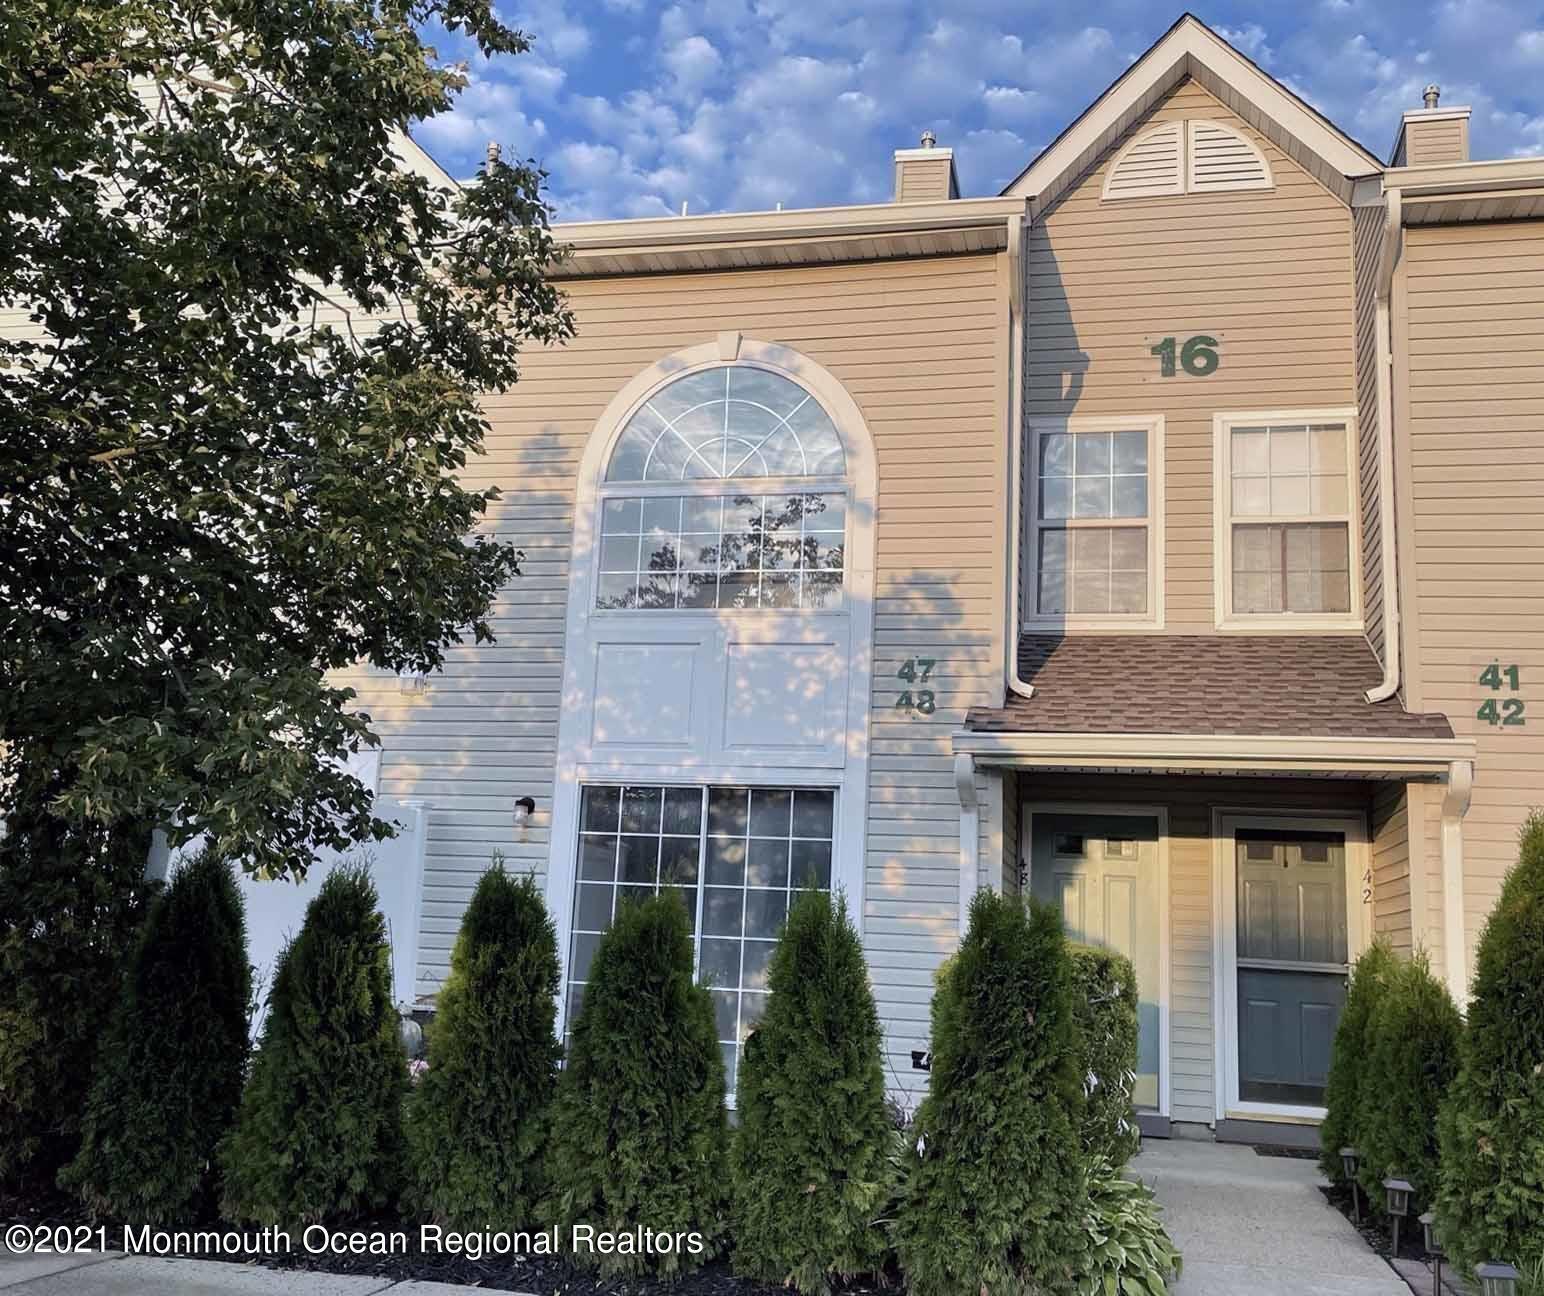 48 Richmond Court, Tinton Falls, NJ 07712 - MLS#: 22124214